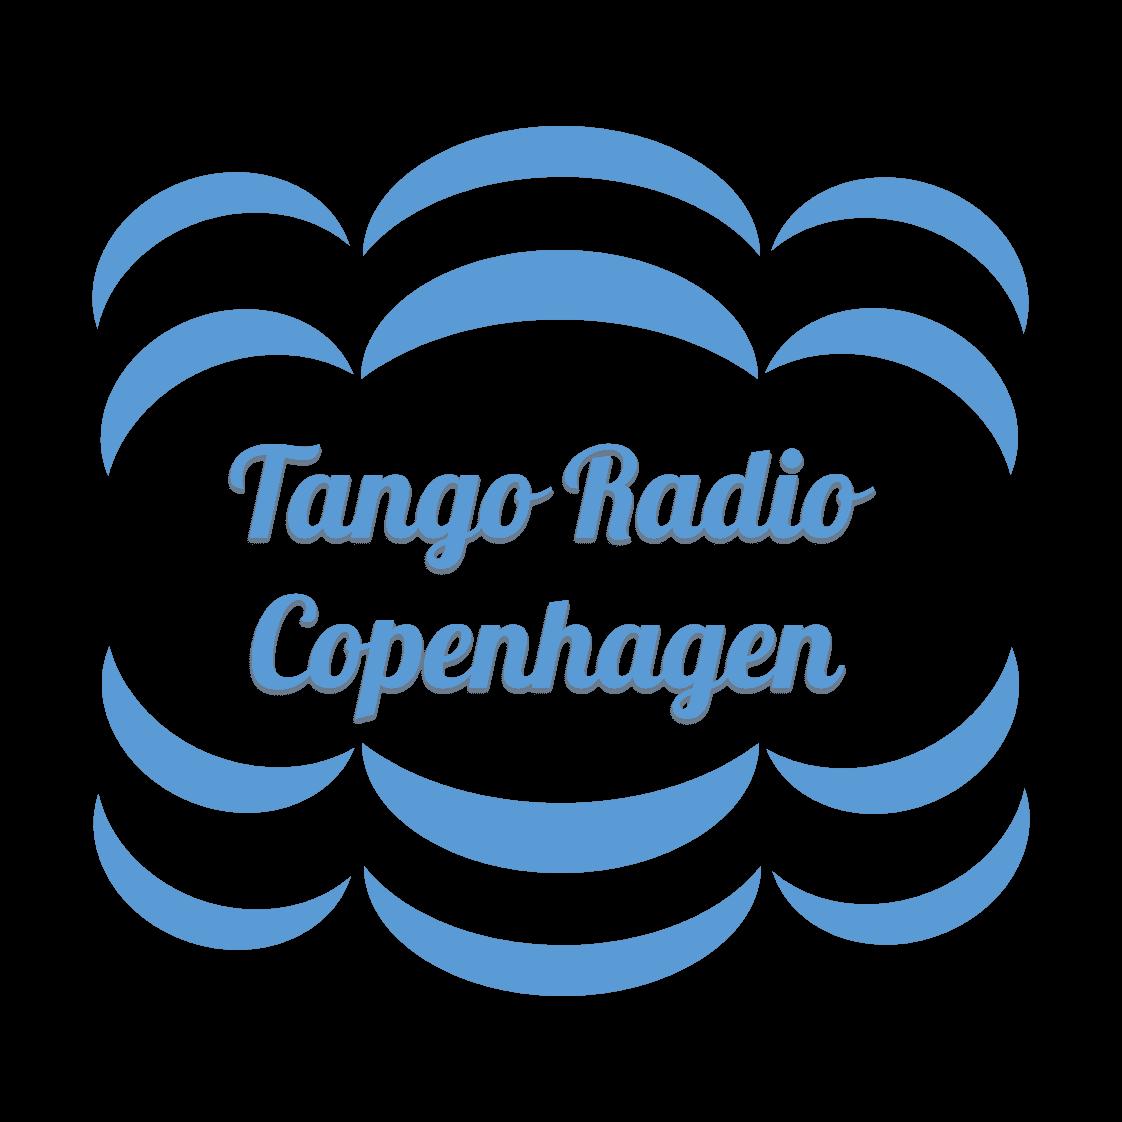 Tango Radio Copenhagen